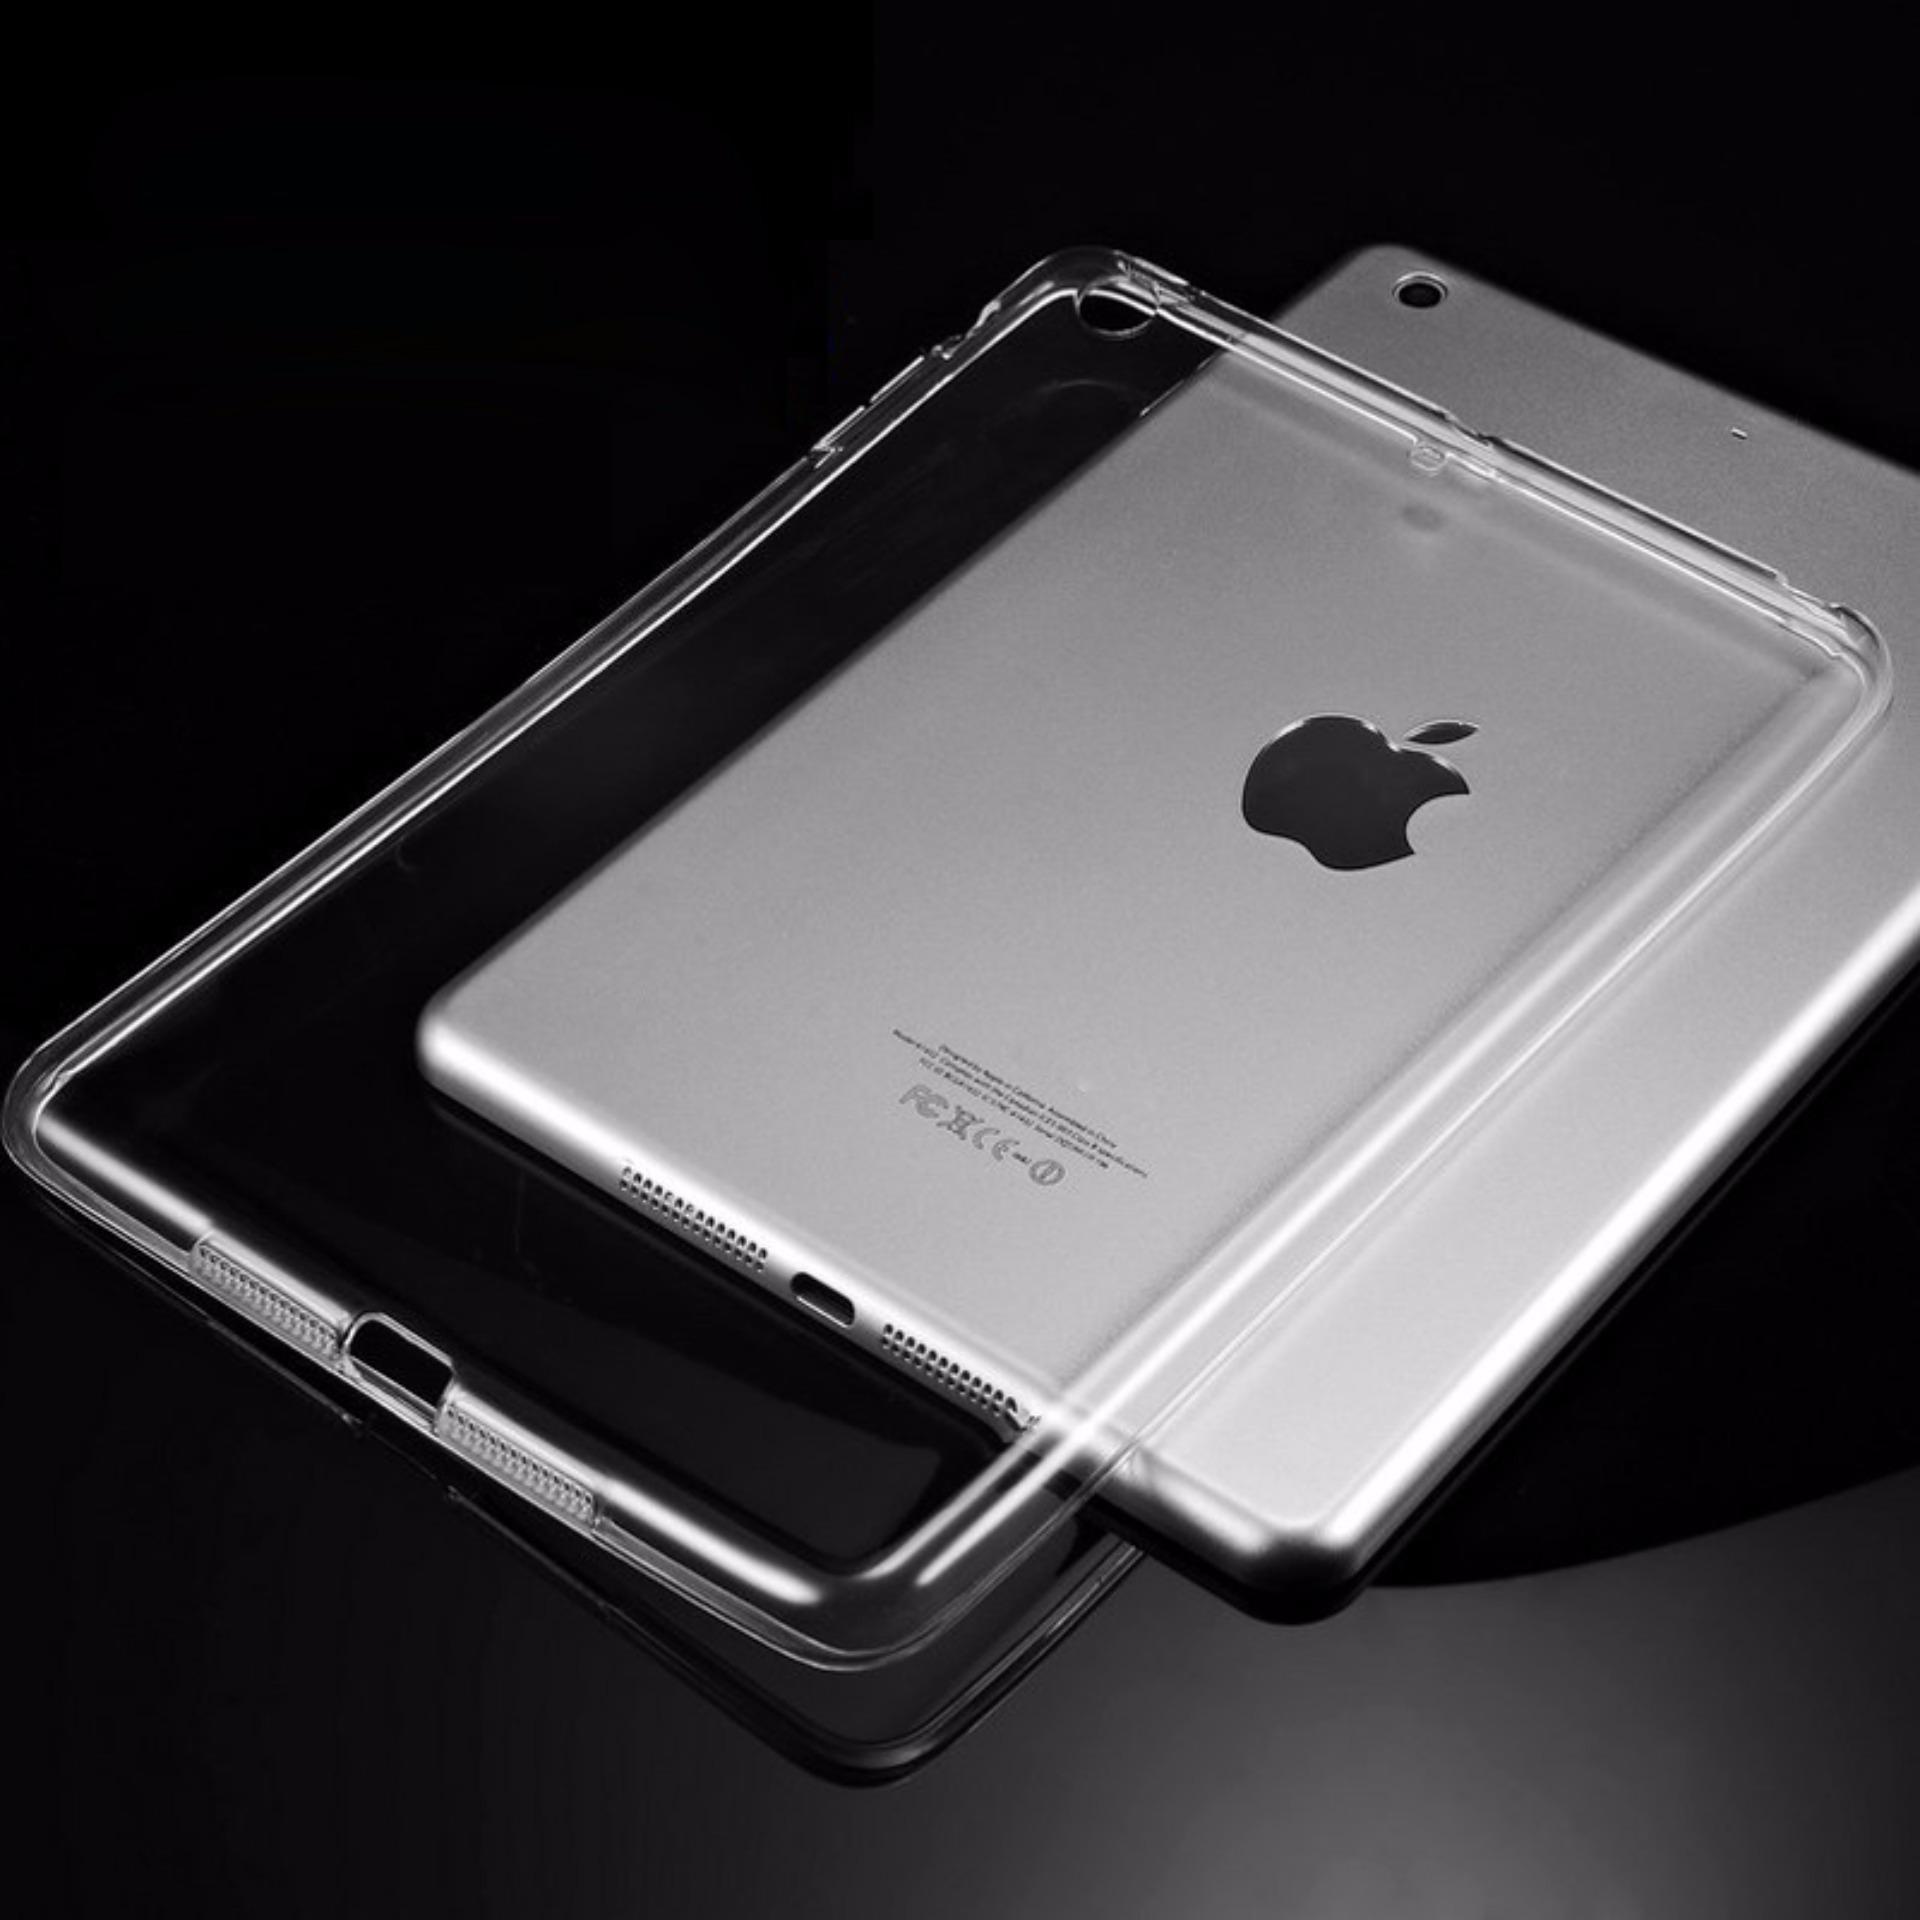 Ốp lưng silicon cho iPad Air 2